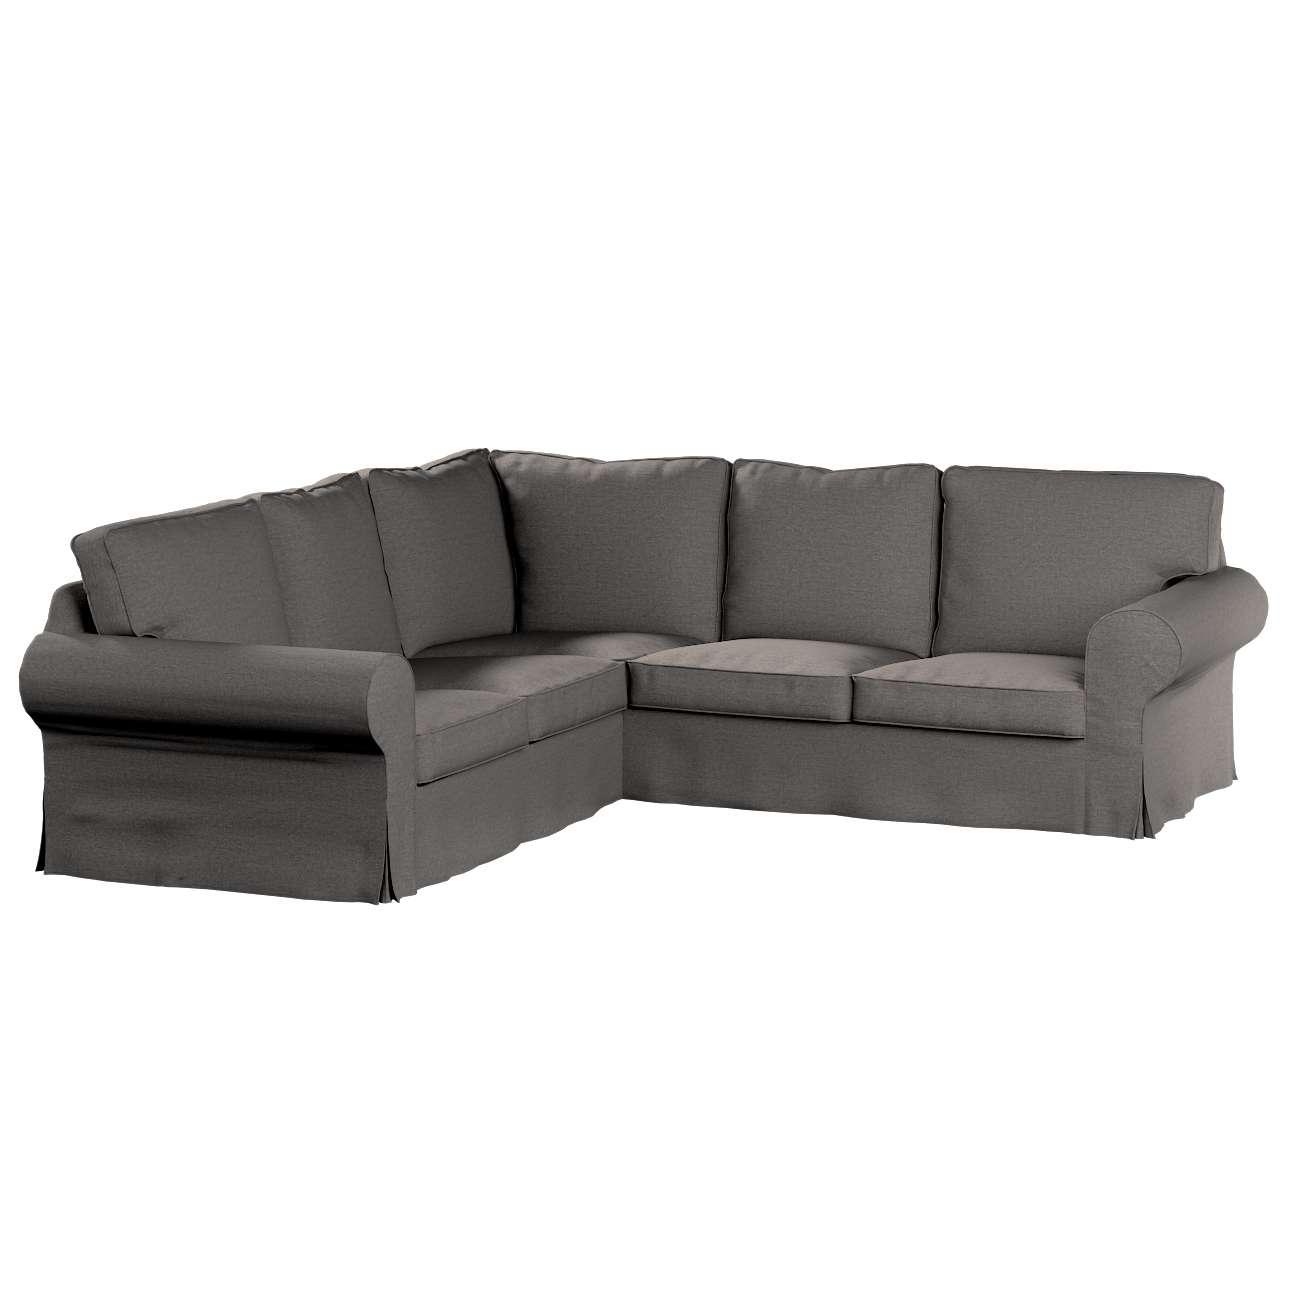 Ektorp kampinė sofa Ektorp kampinė sofa kolekcijoje Edinburgh , audinys: 115-77